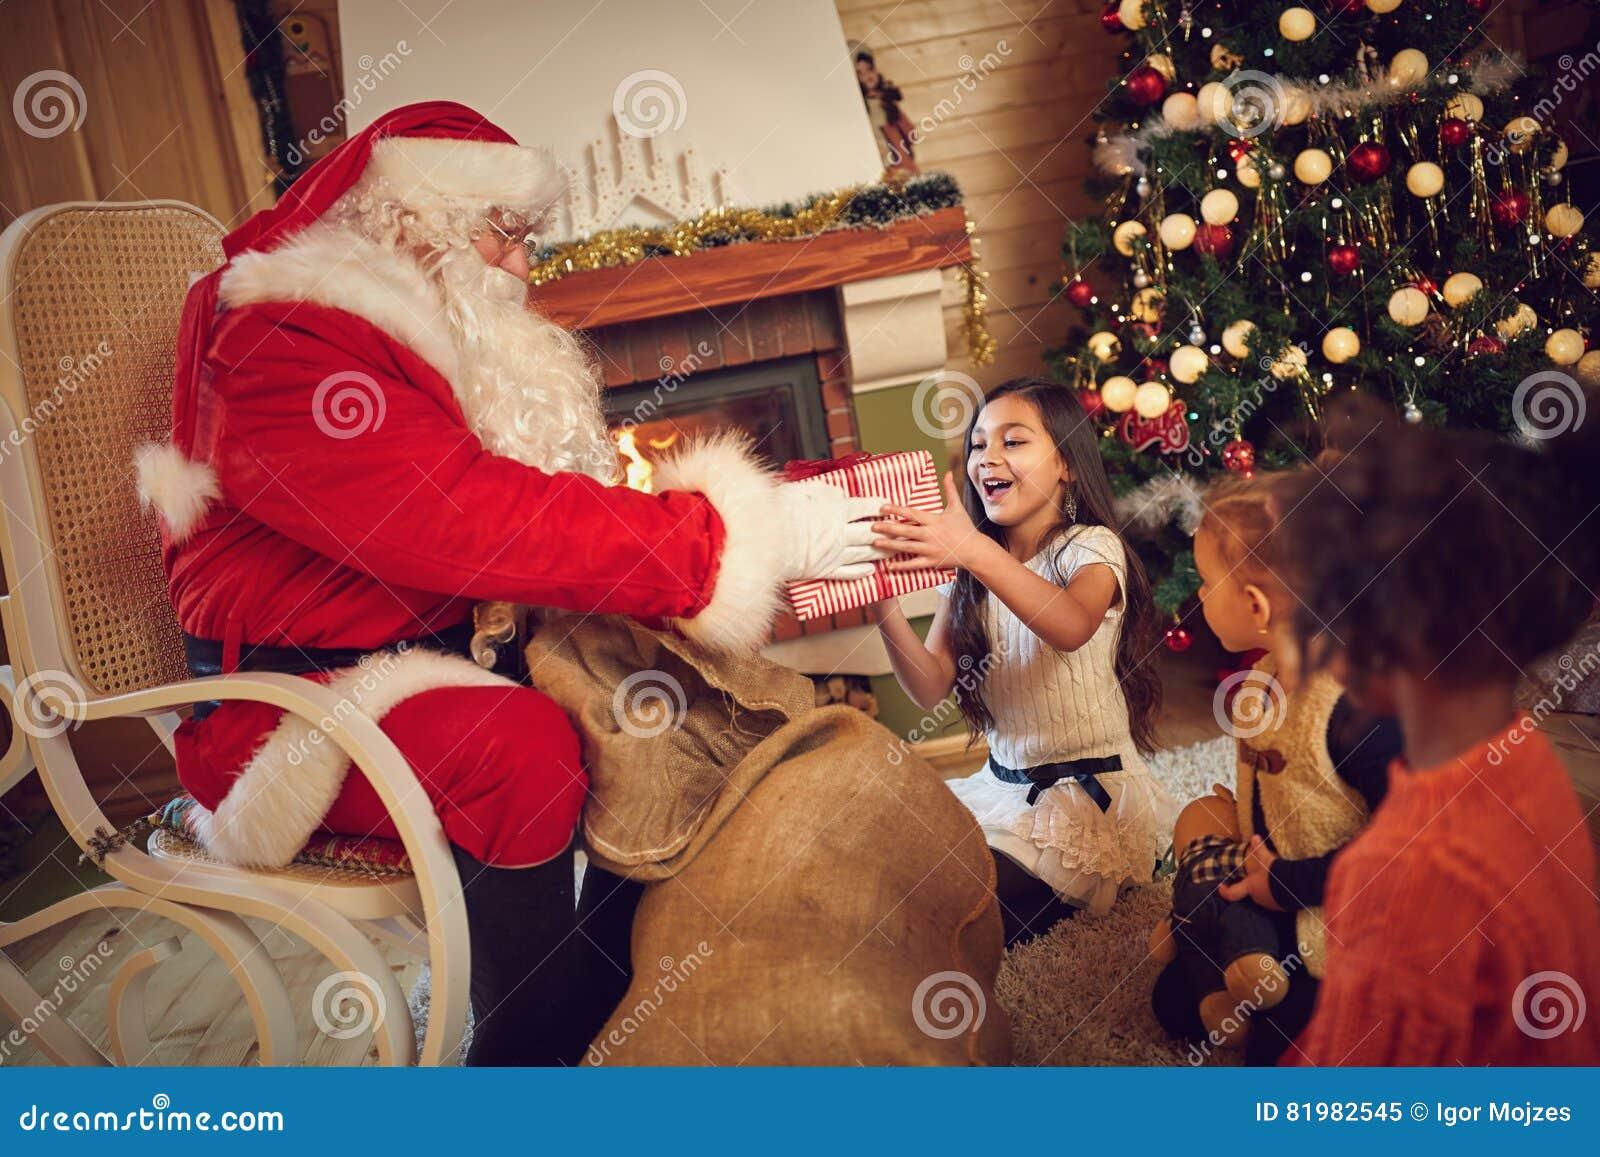 Presente alegremente tomado da menina de Santa Claus